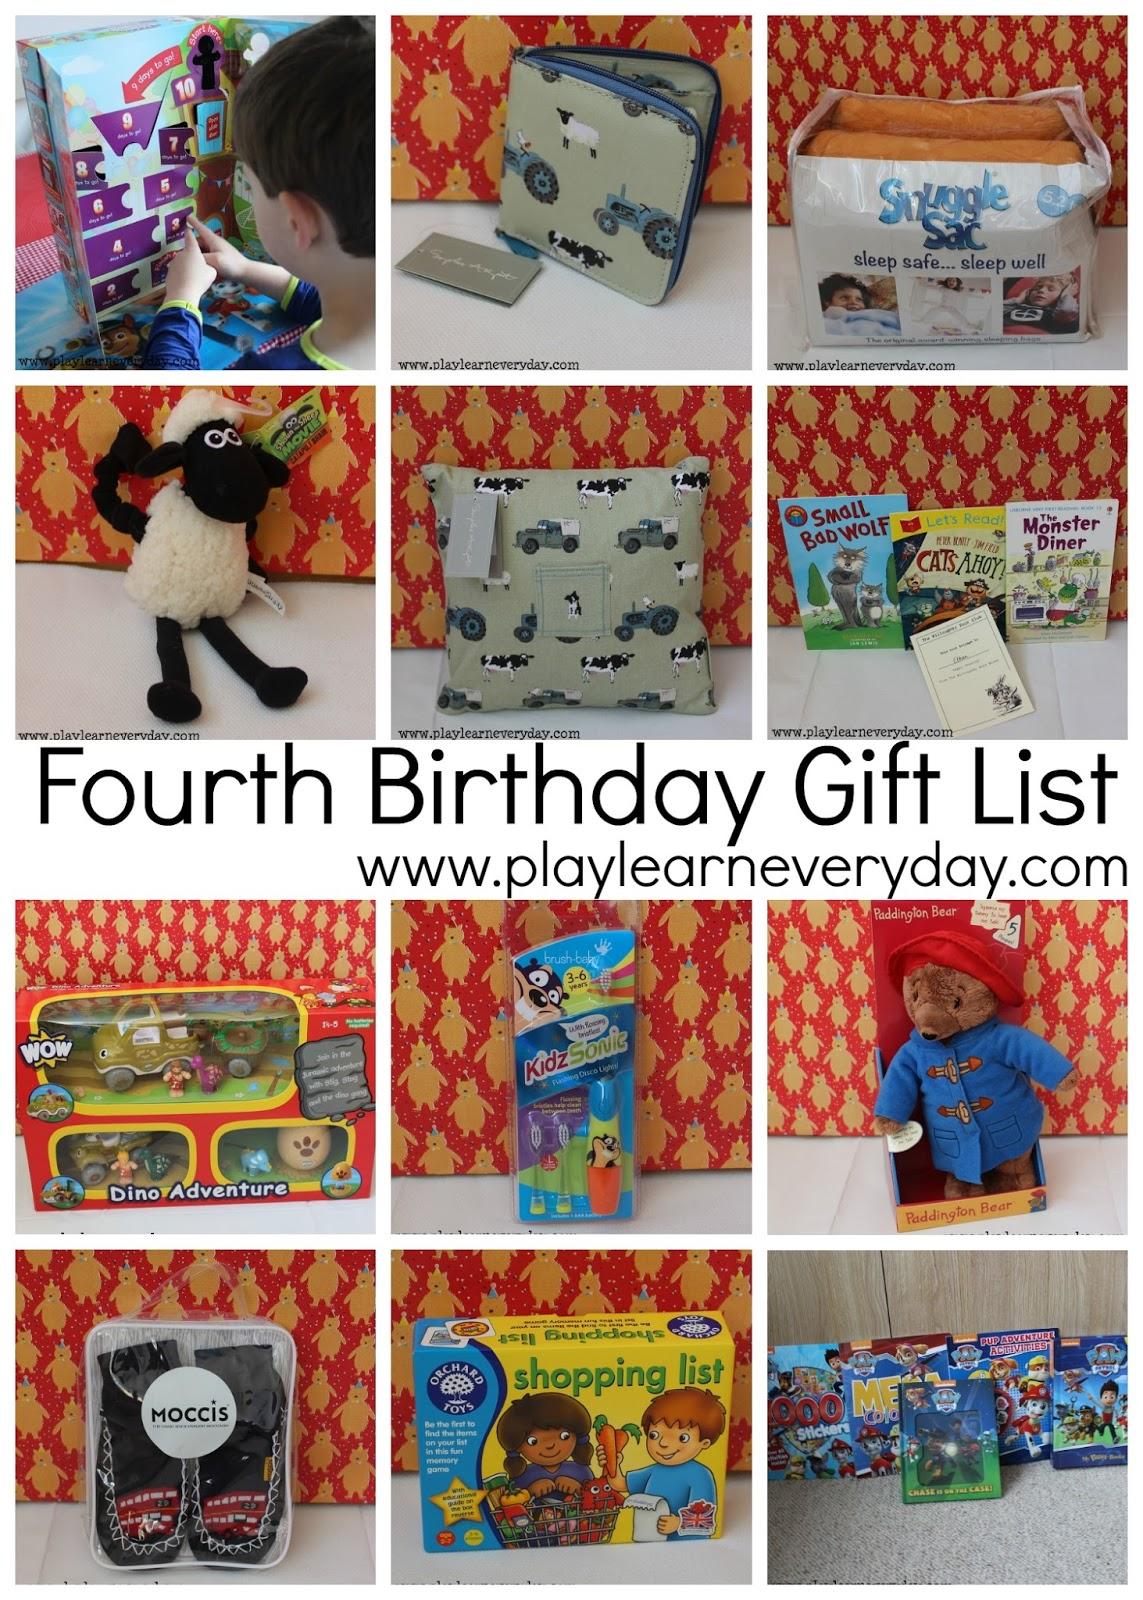 Fourth Birthday Gift List